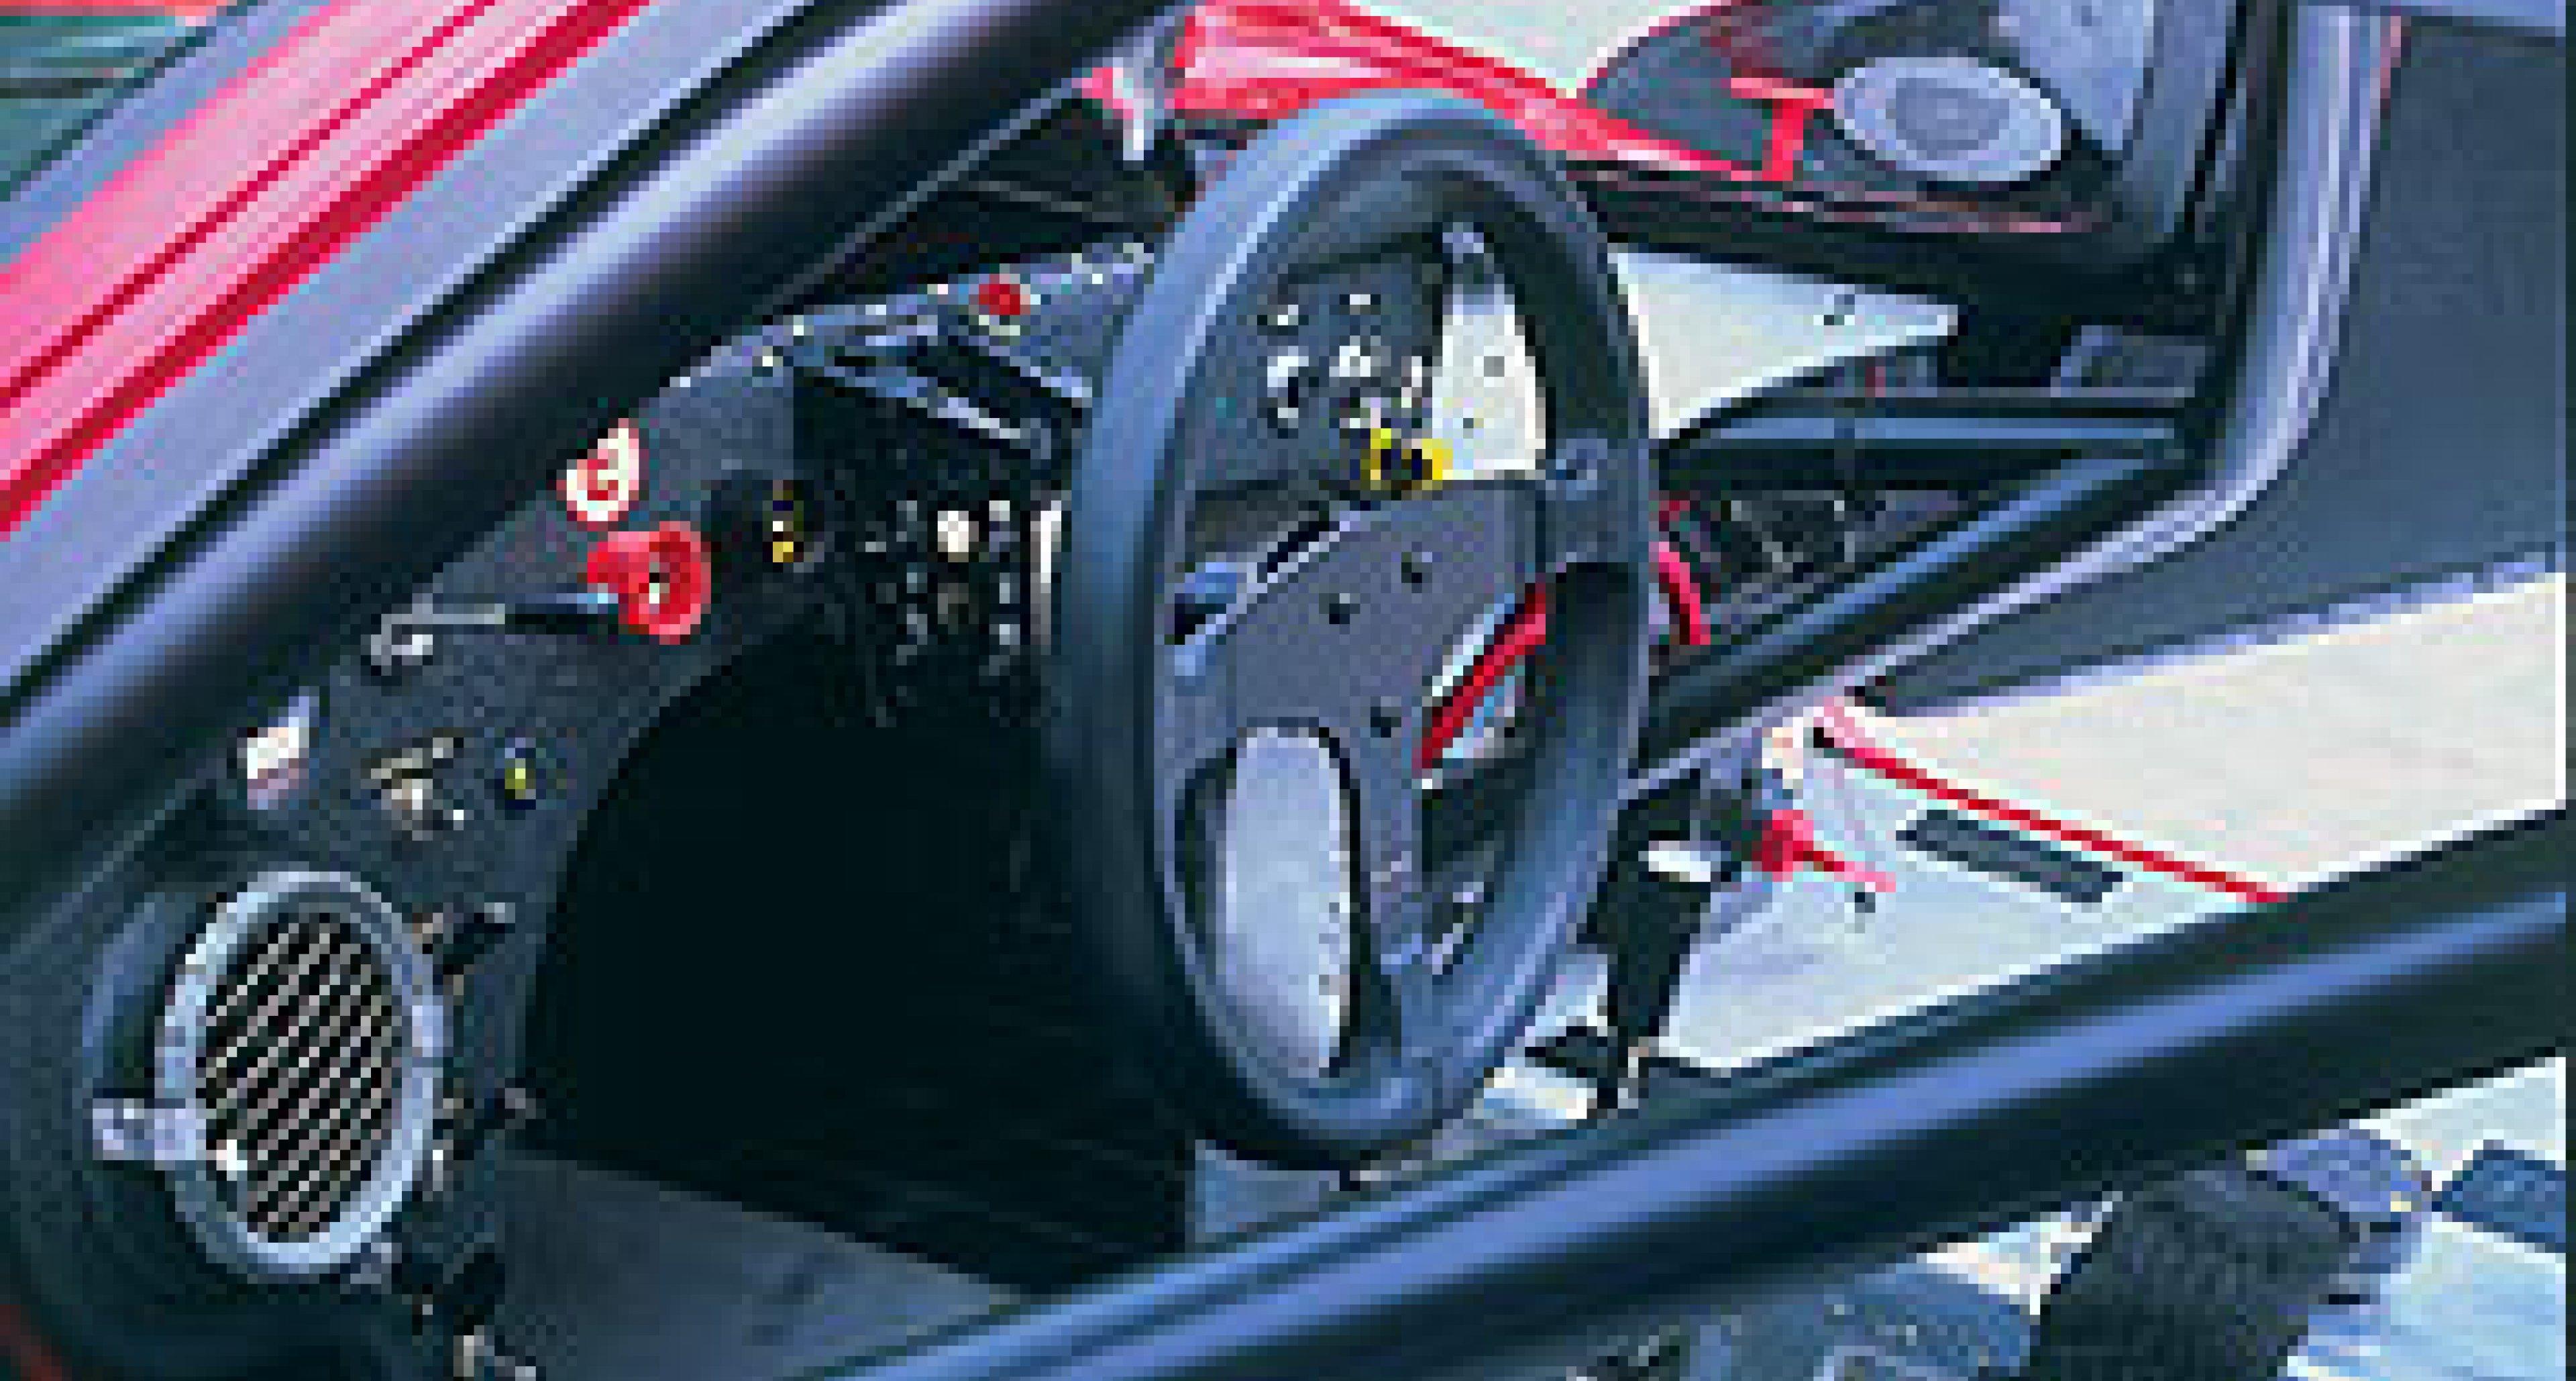 Glorious: The Ferrari P3